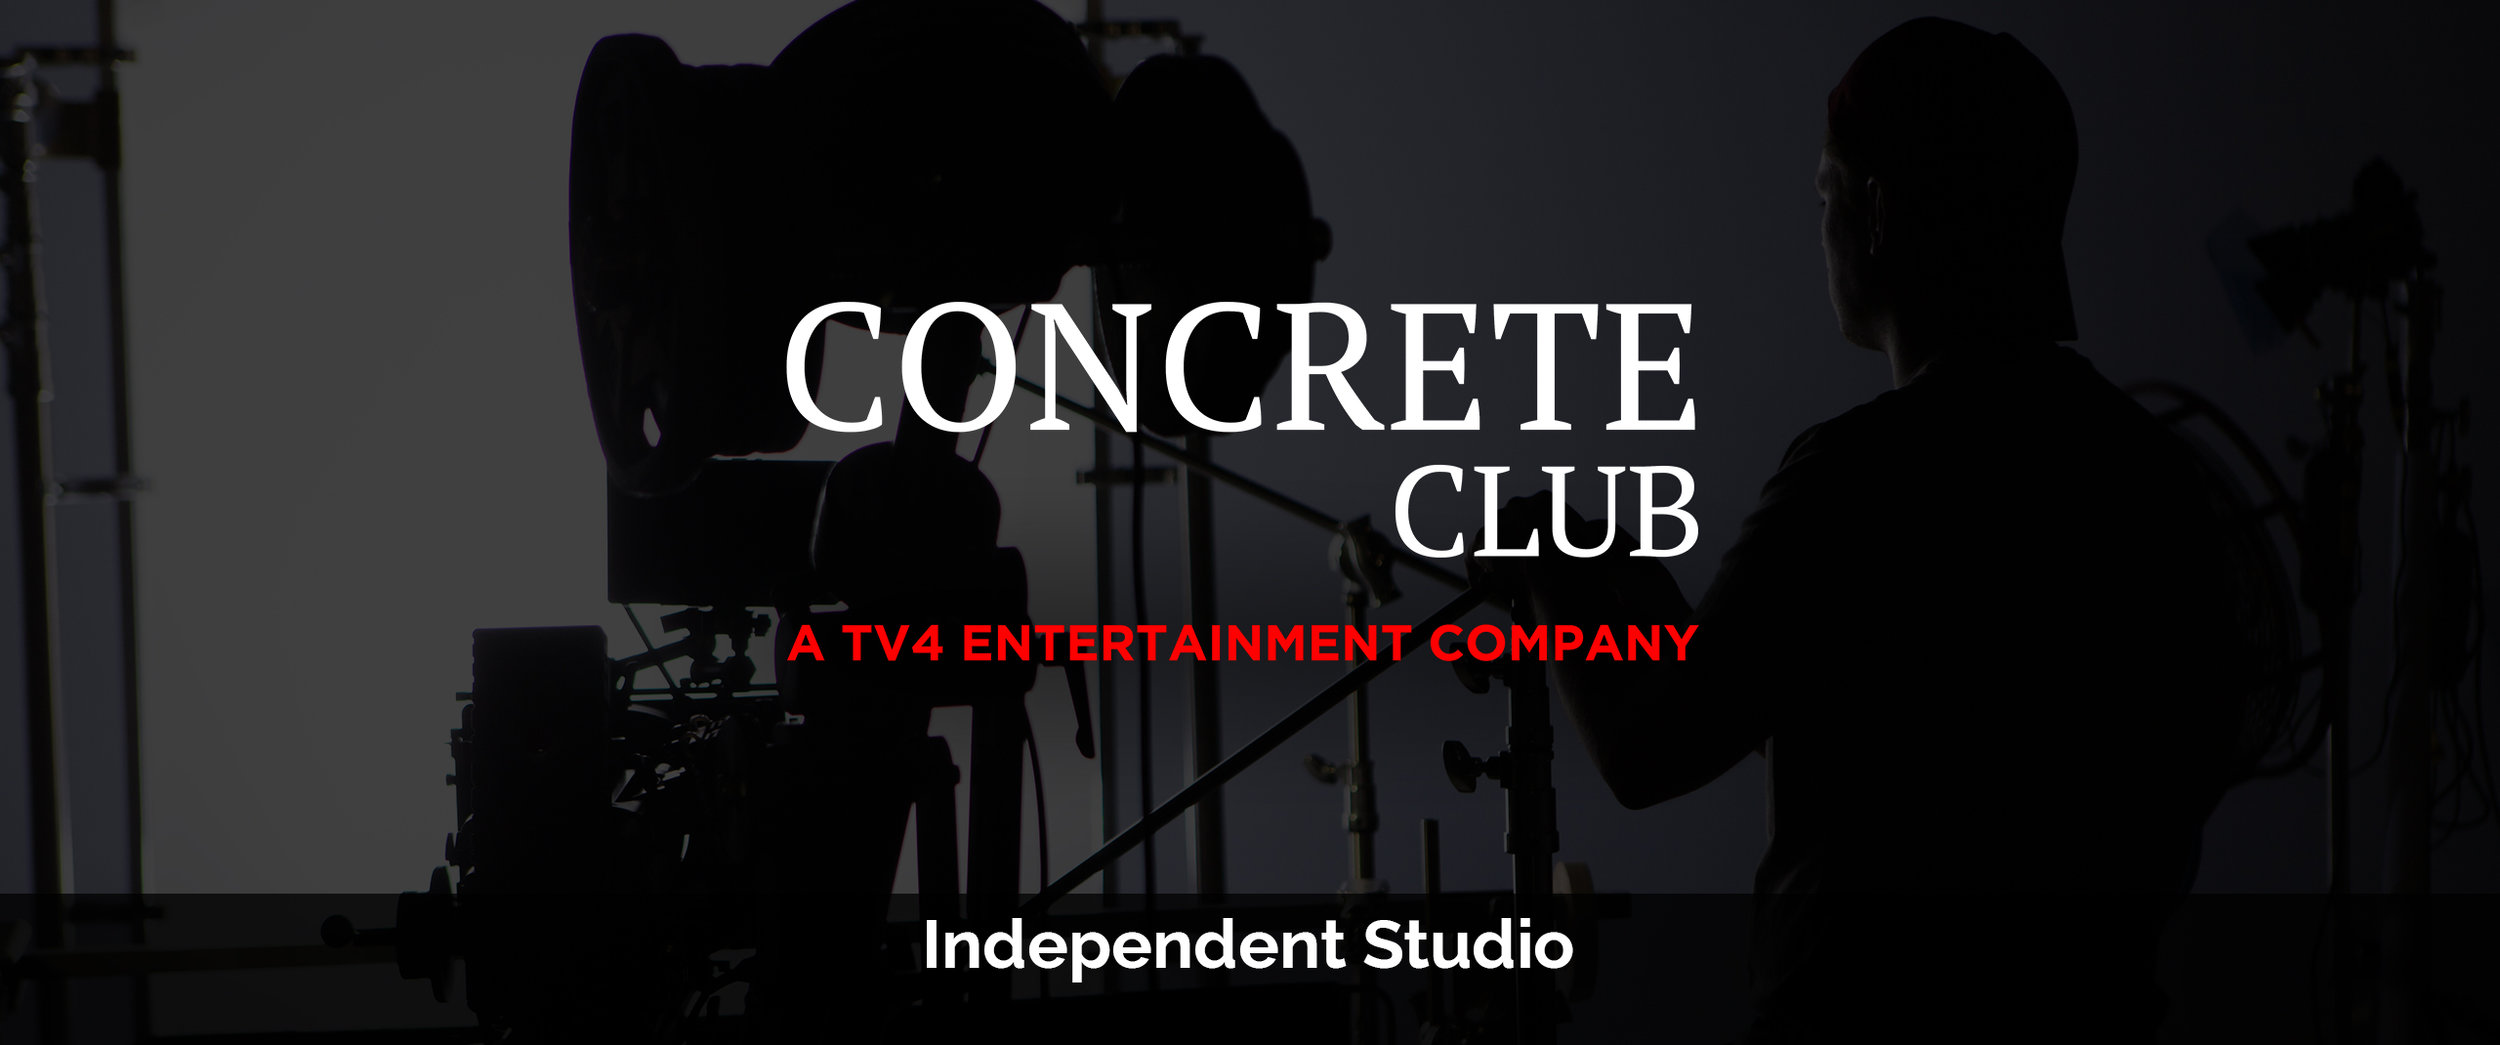 ConcreteClub-Gallery.jpg